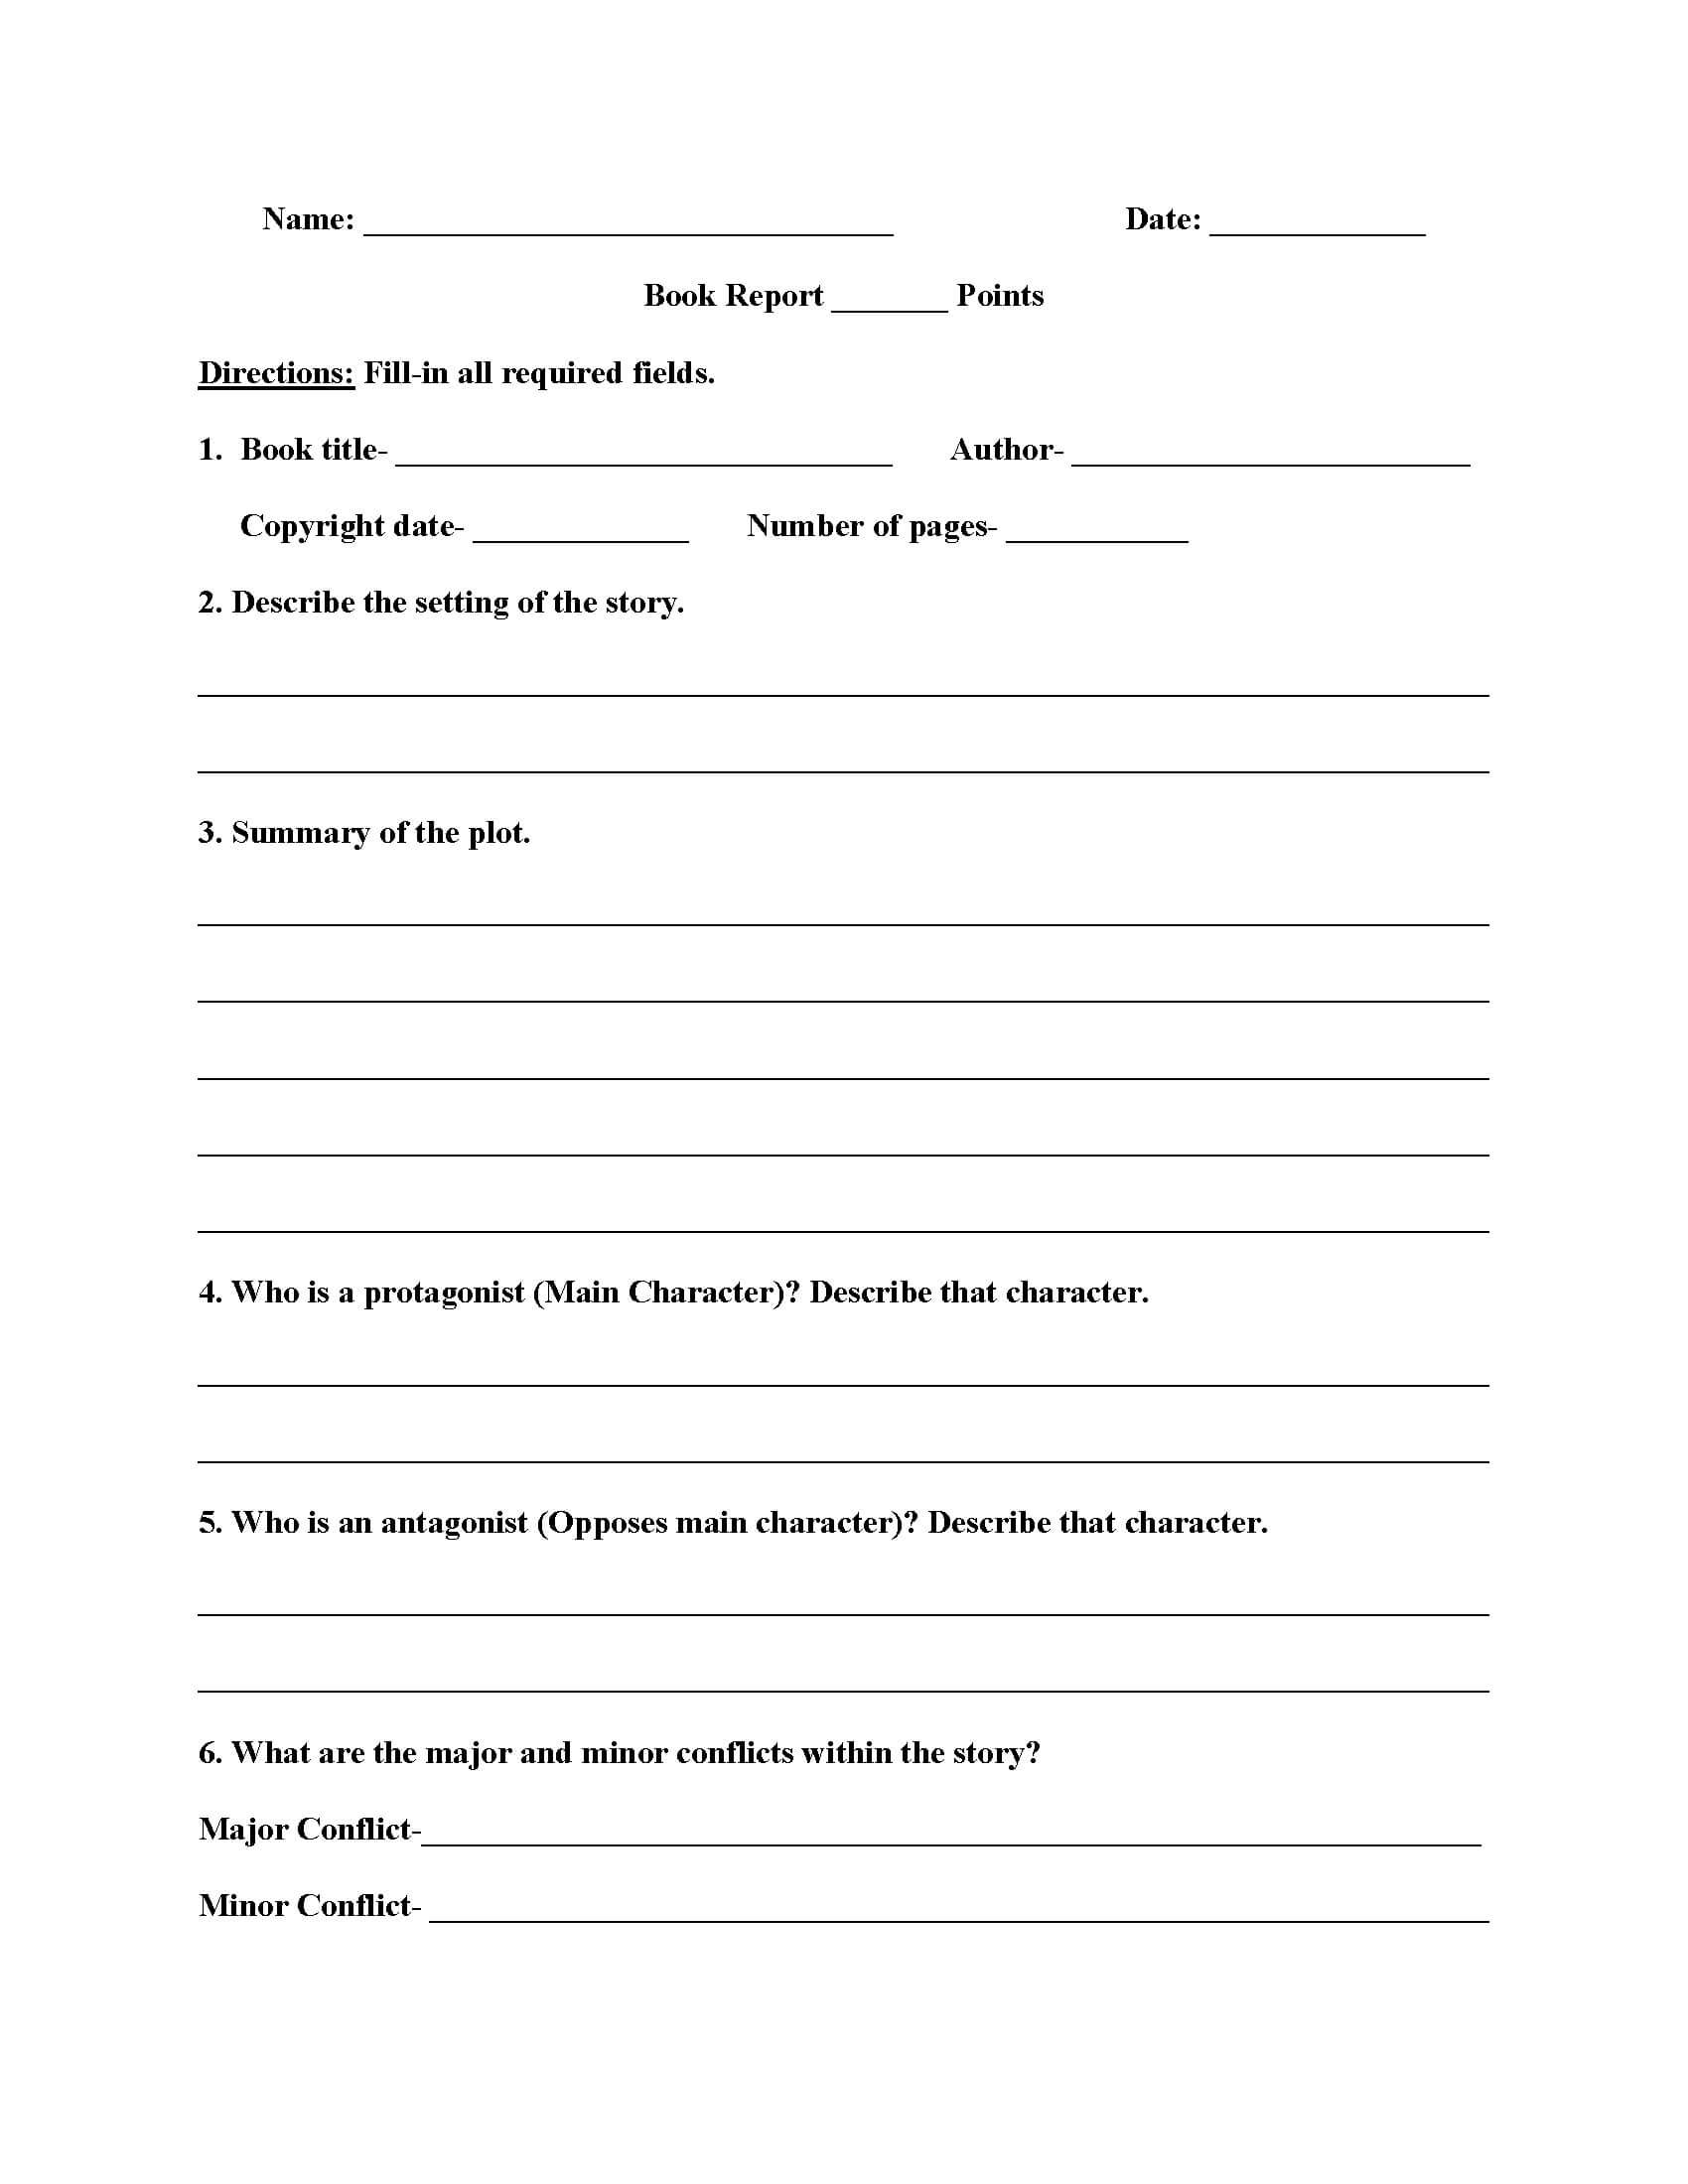 011 Template Ideas 6Th Grade Book Report High Non Fiction Inside Book Report Template 6Th Grade